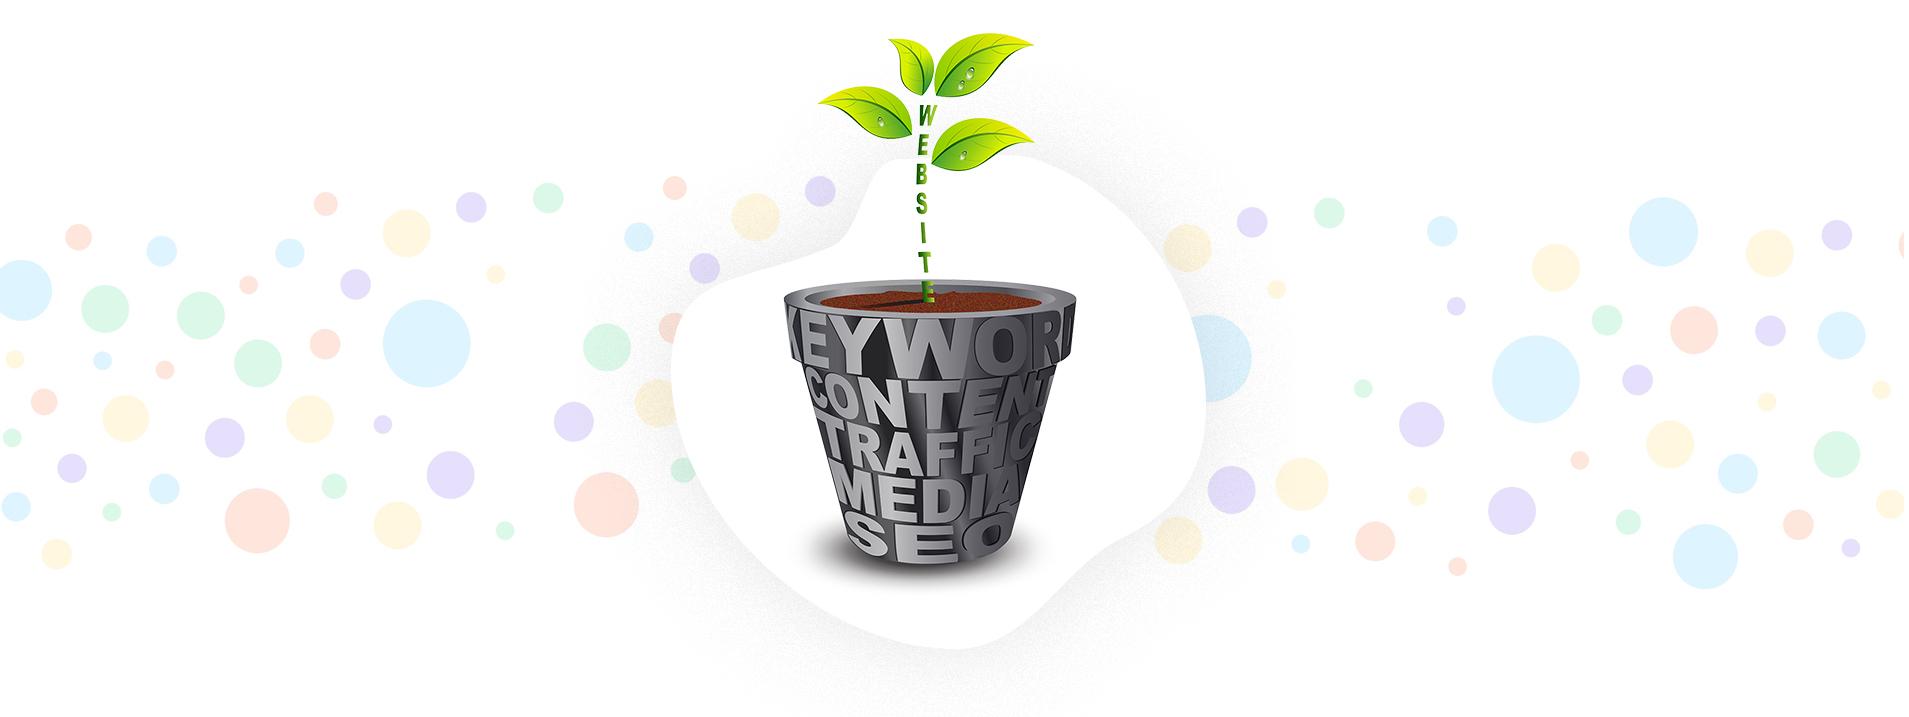 softqube design keyword content